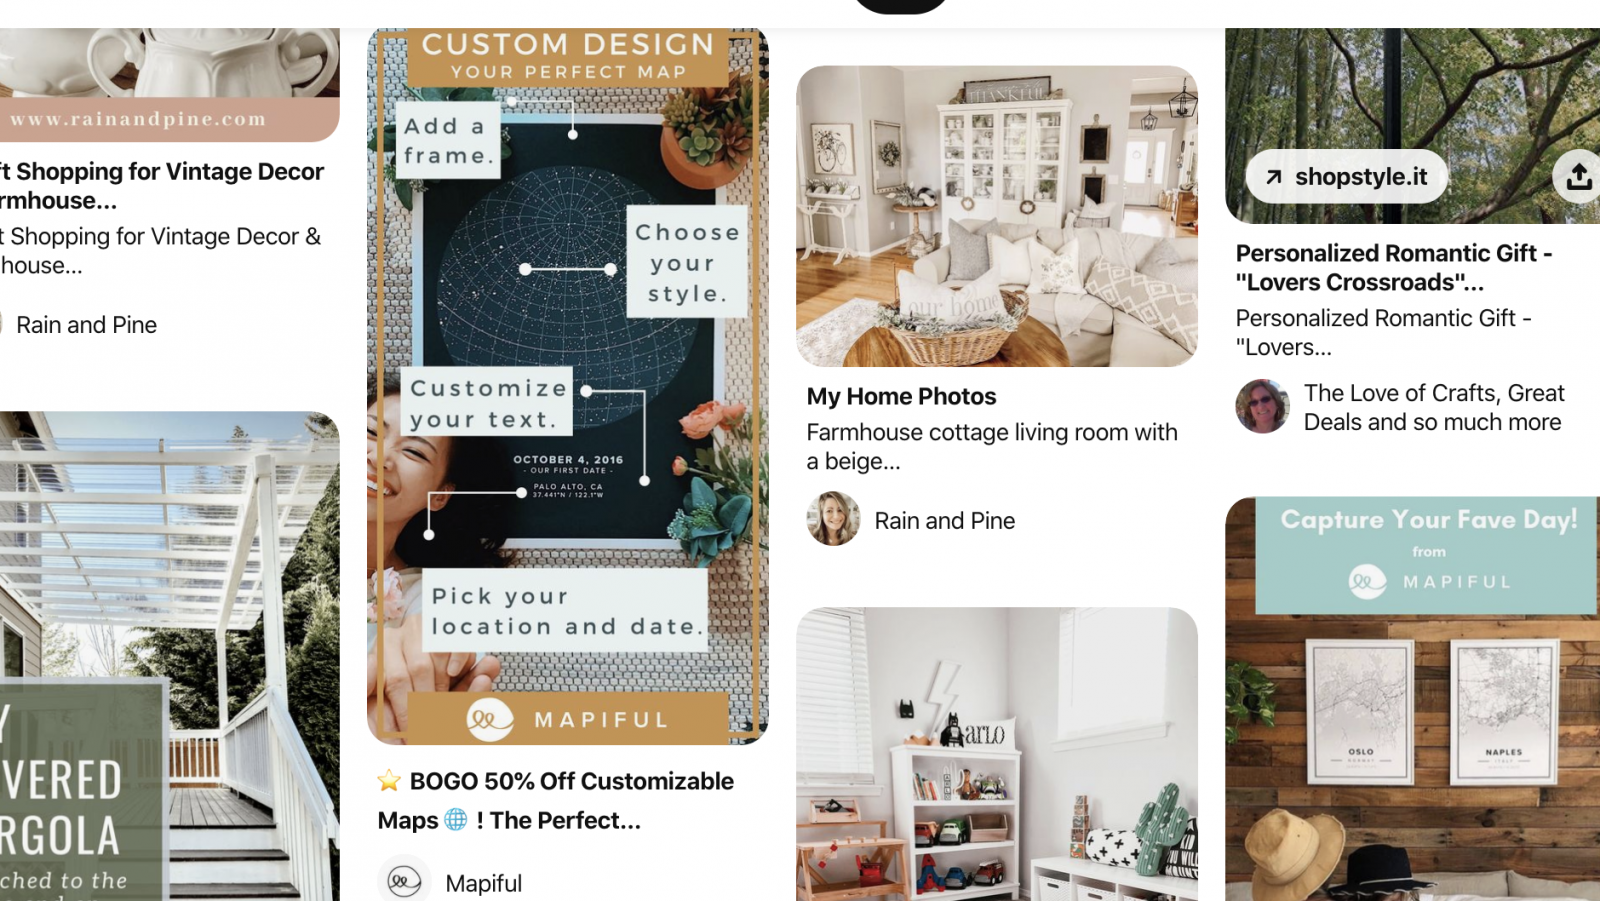 Pinterest mood board for interior design